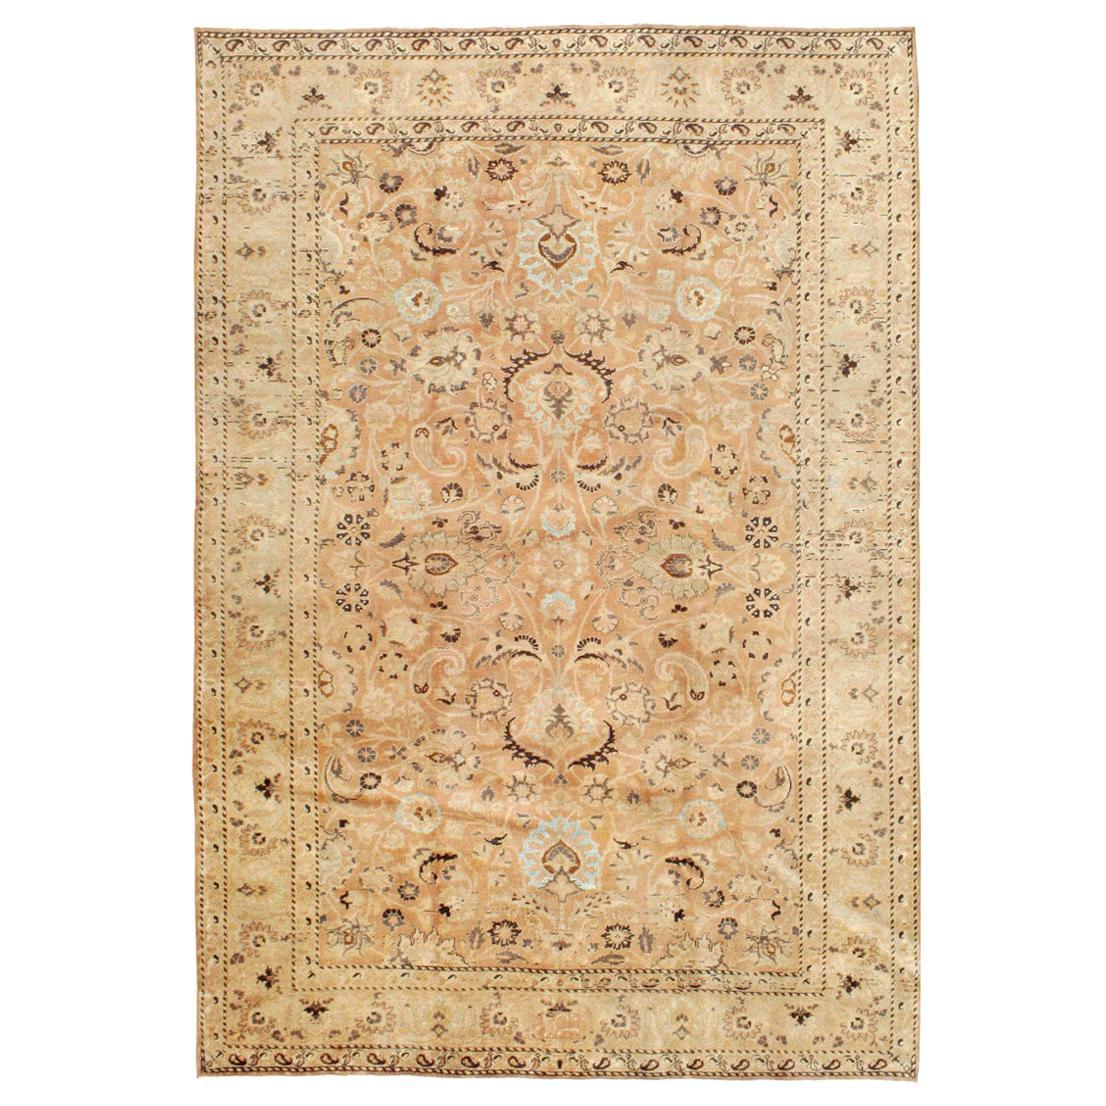 Mid-20th Century Handmade Persian Mashad Room Size Accent Rug